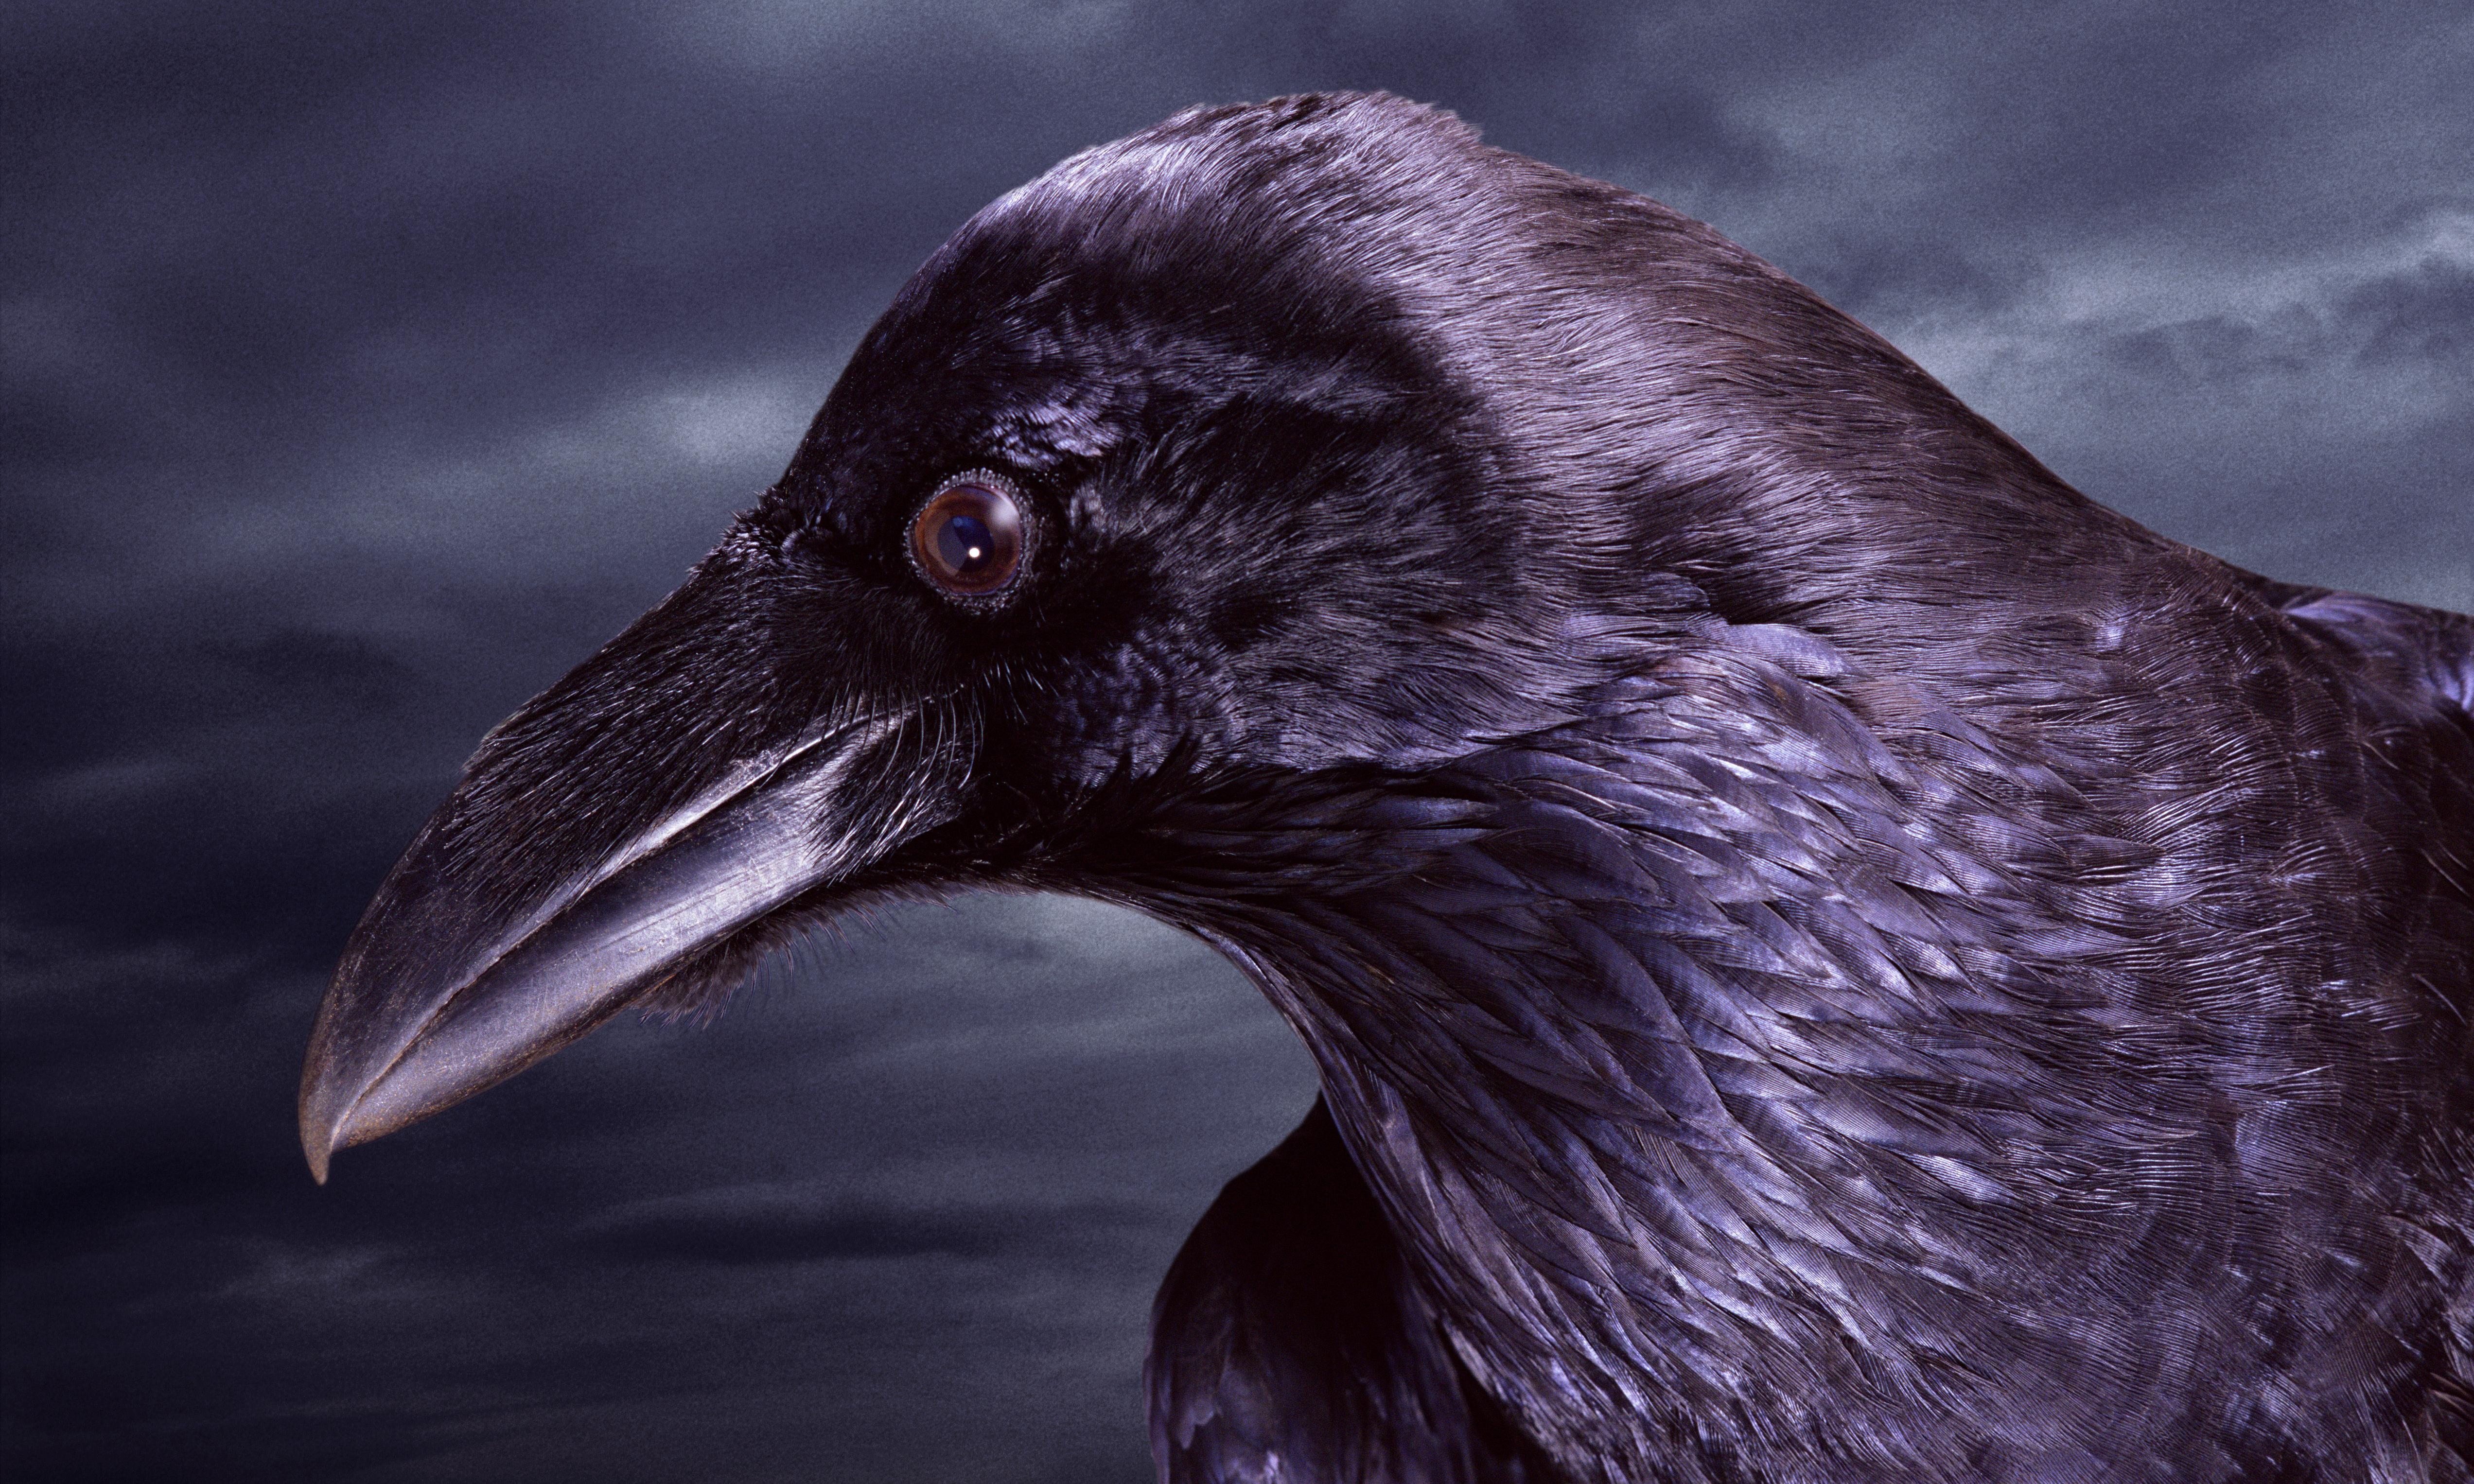 Warrior, trickster, messenger, god: the raven is the best of all birds